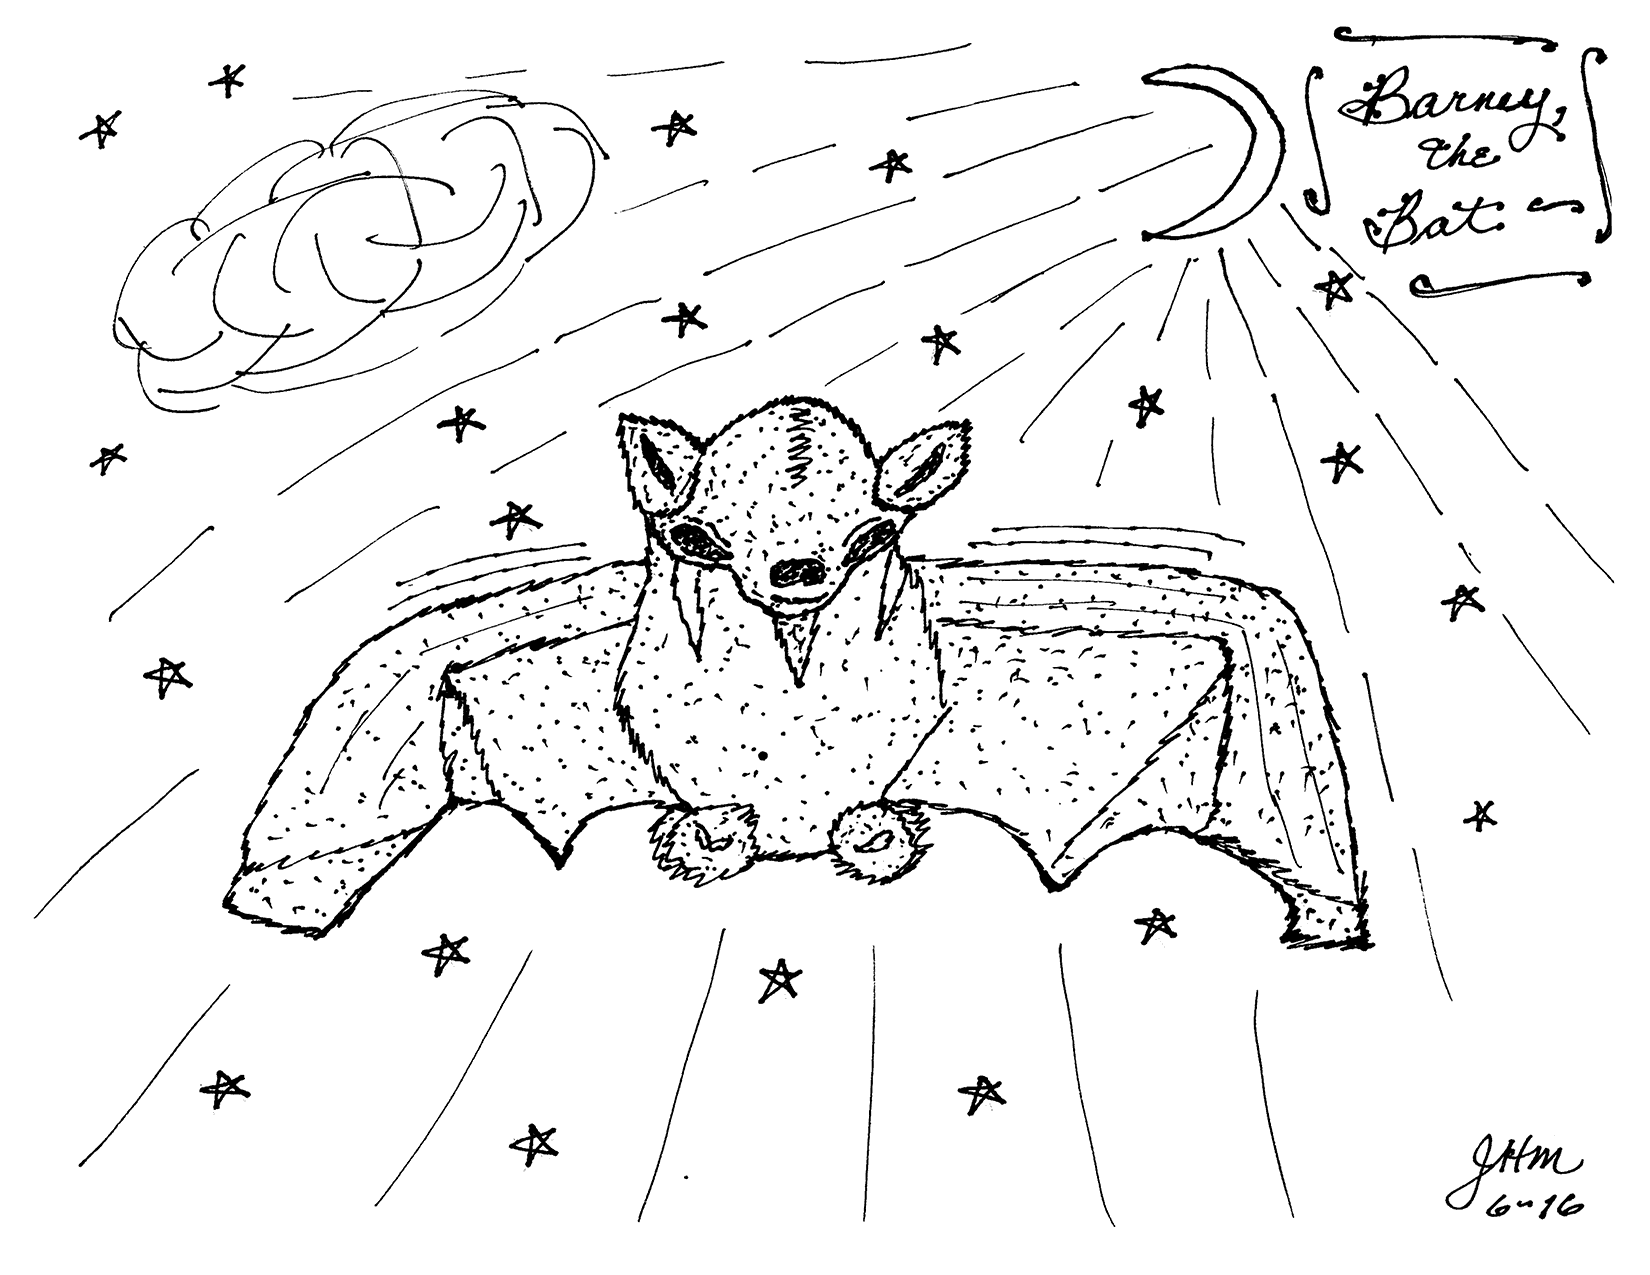 Barney the Bat